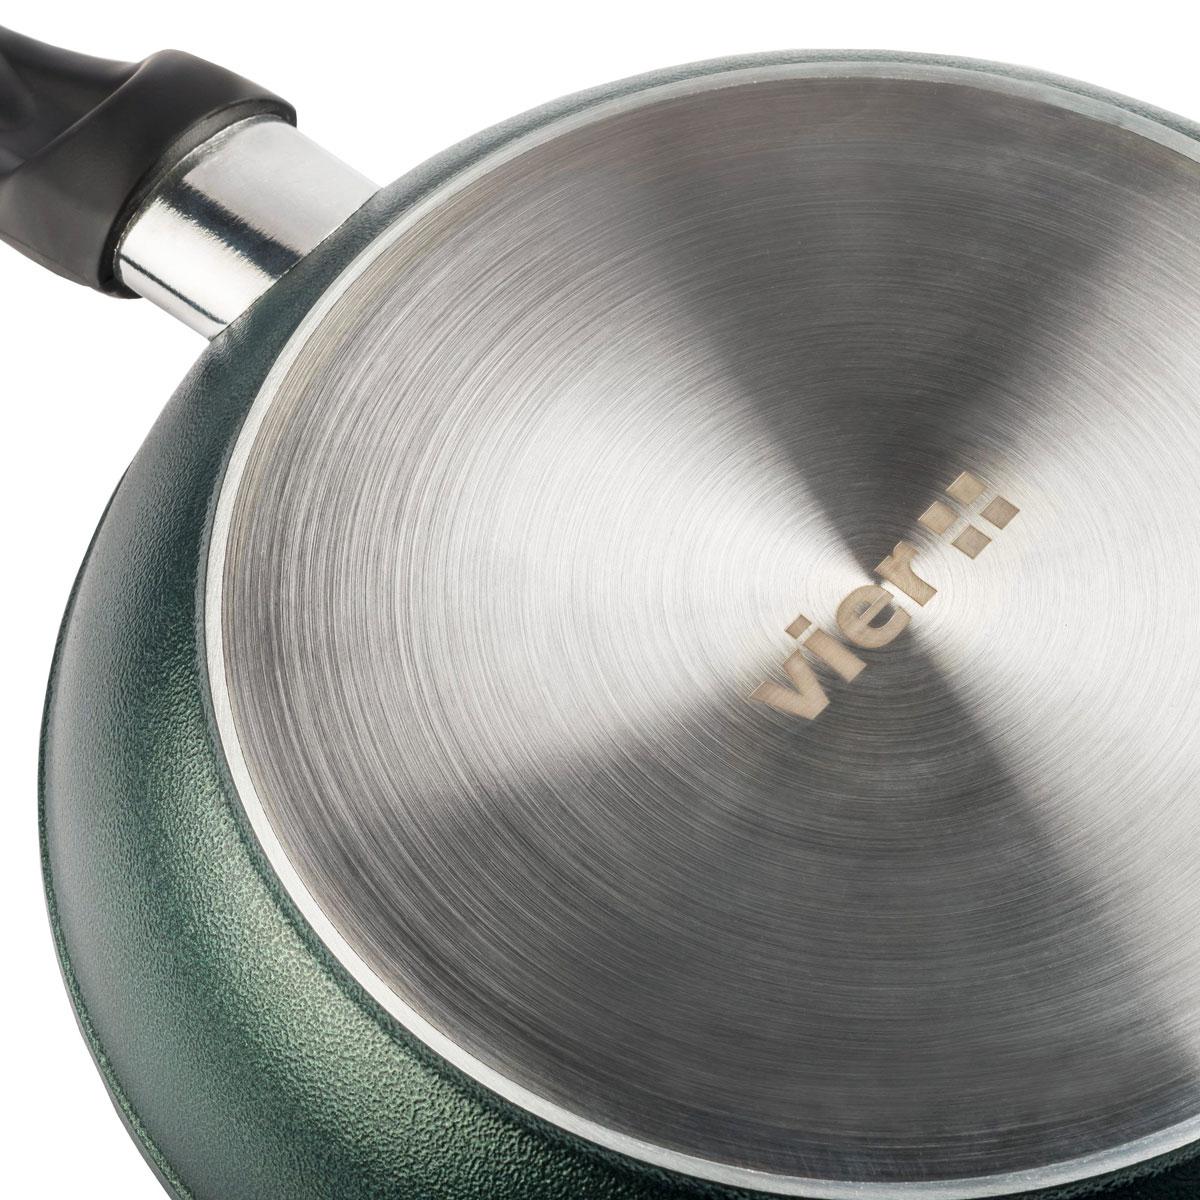 Sartén de aluminio forjado